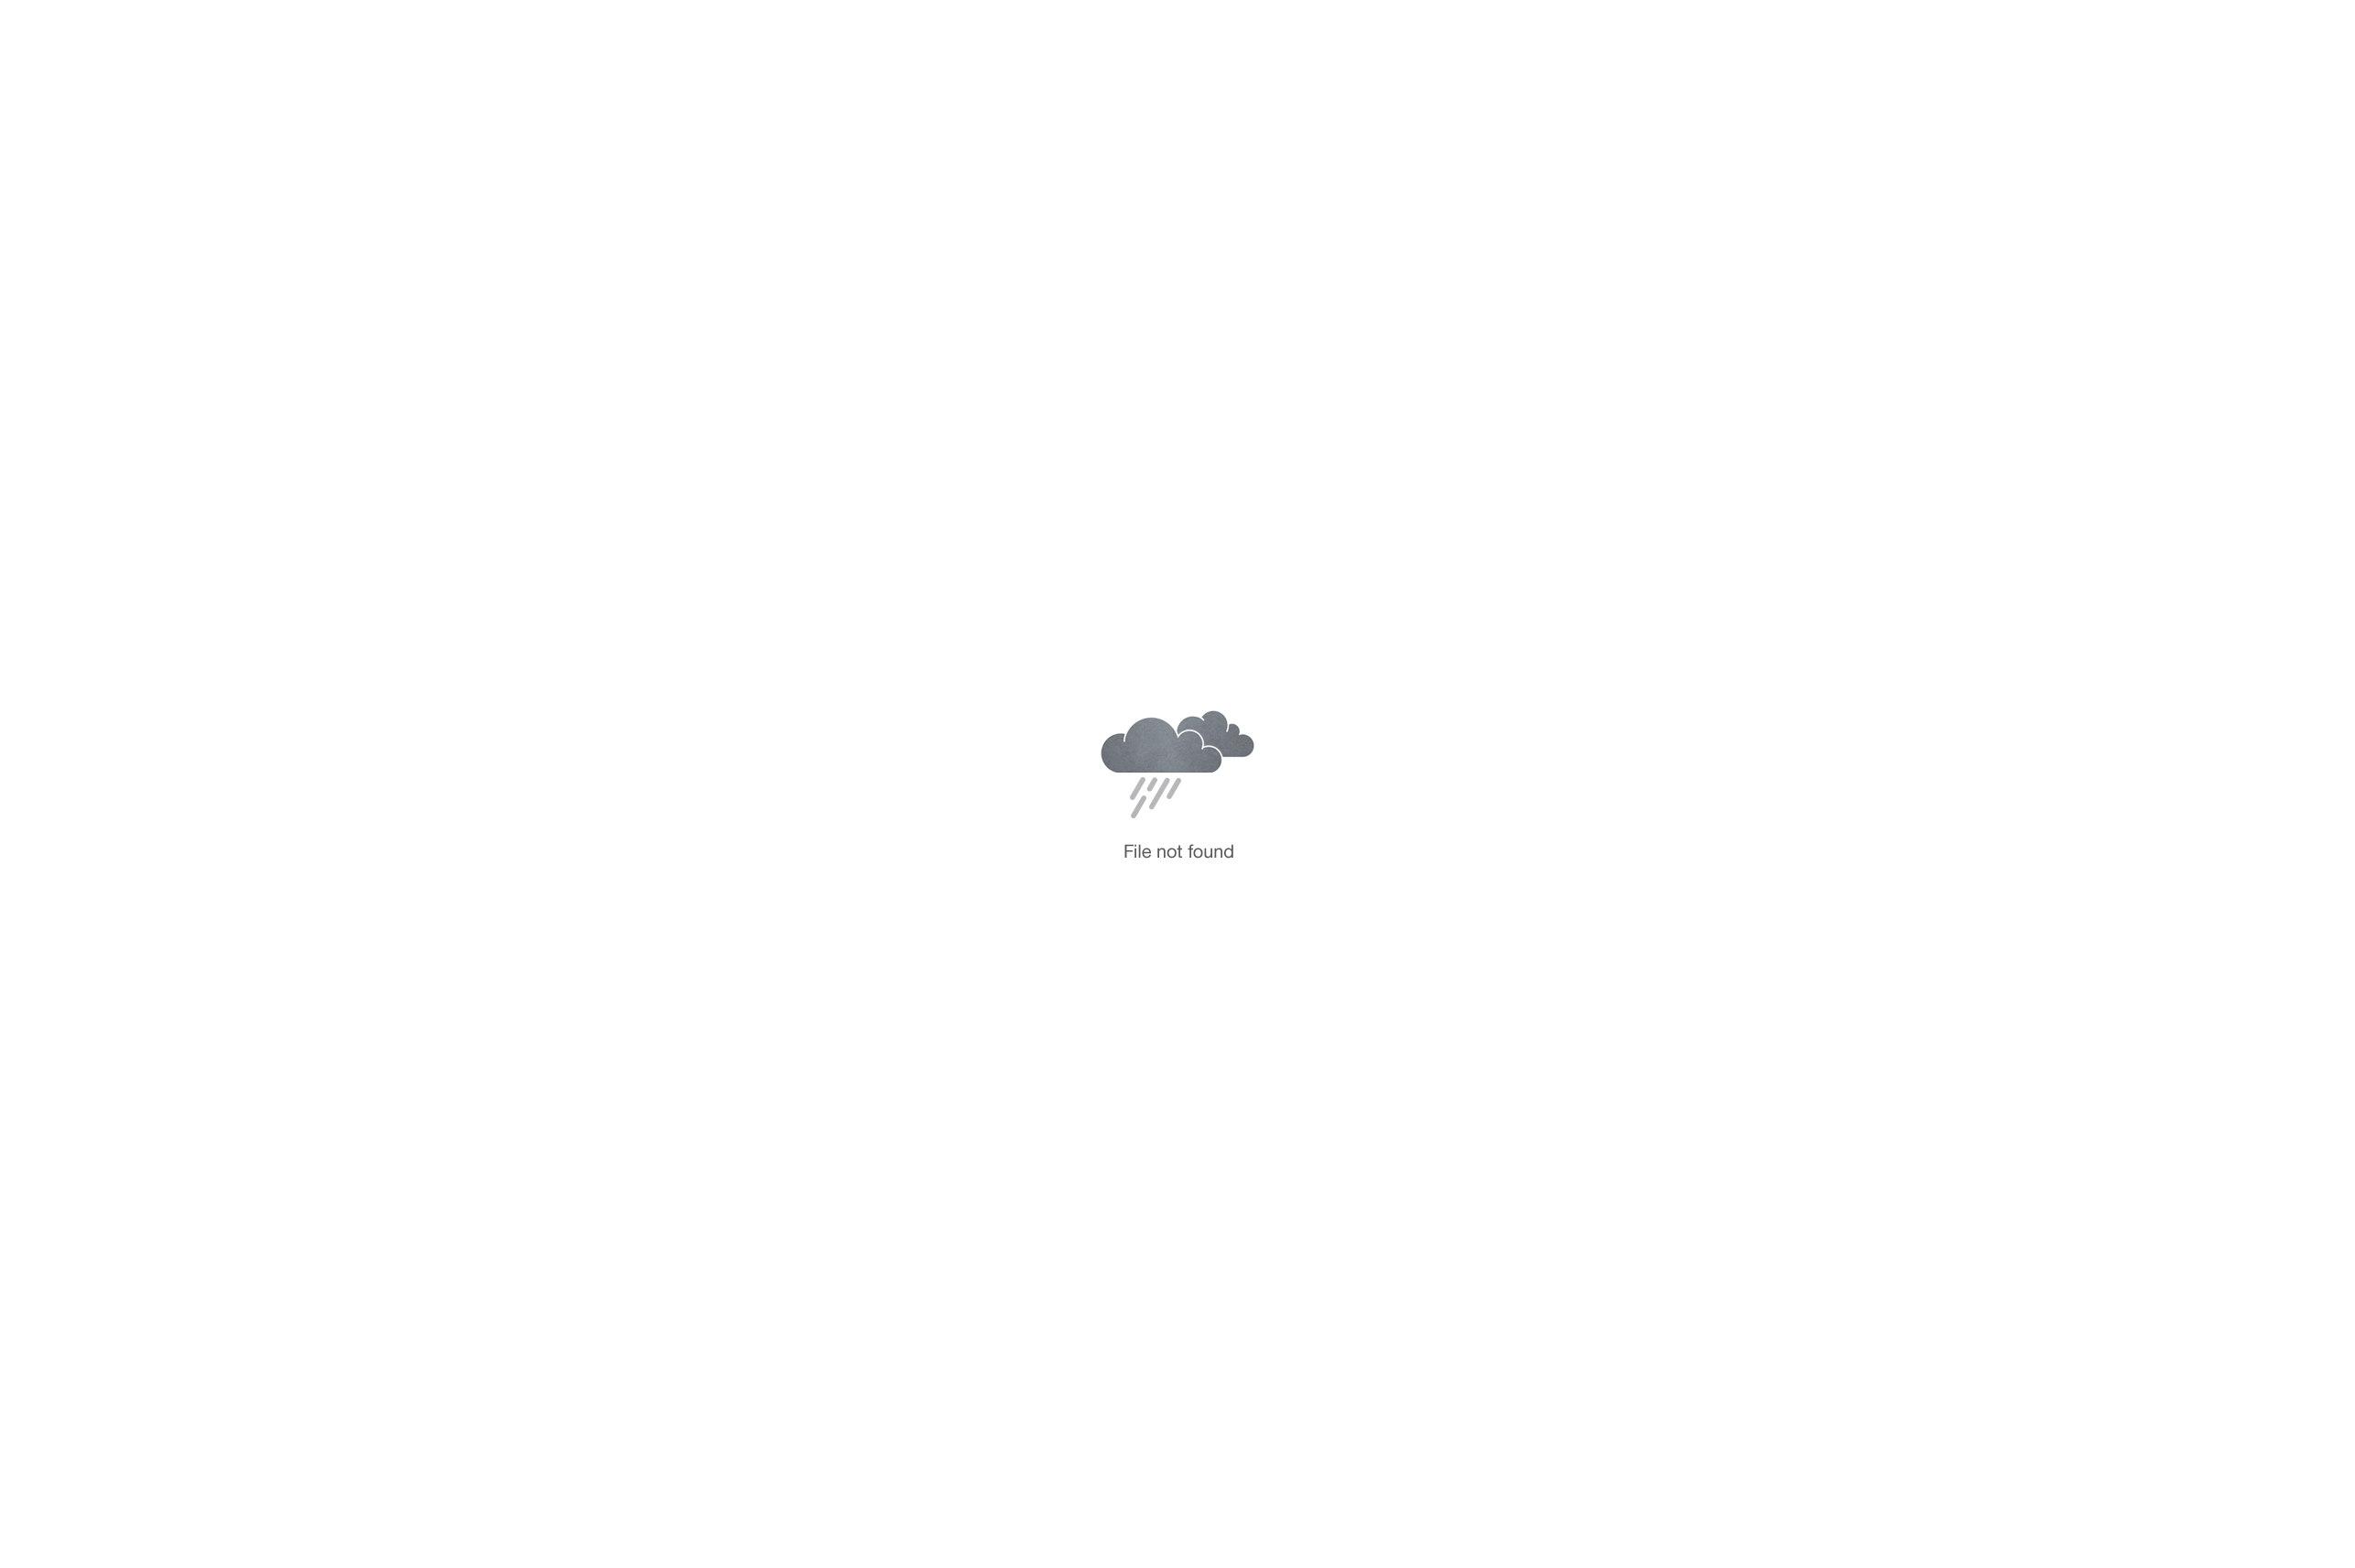 PETIT-LENOIR-Manon-Snowboard-Sponsorise-me-image-4